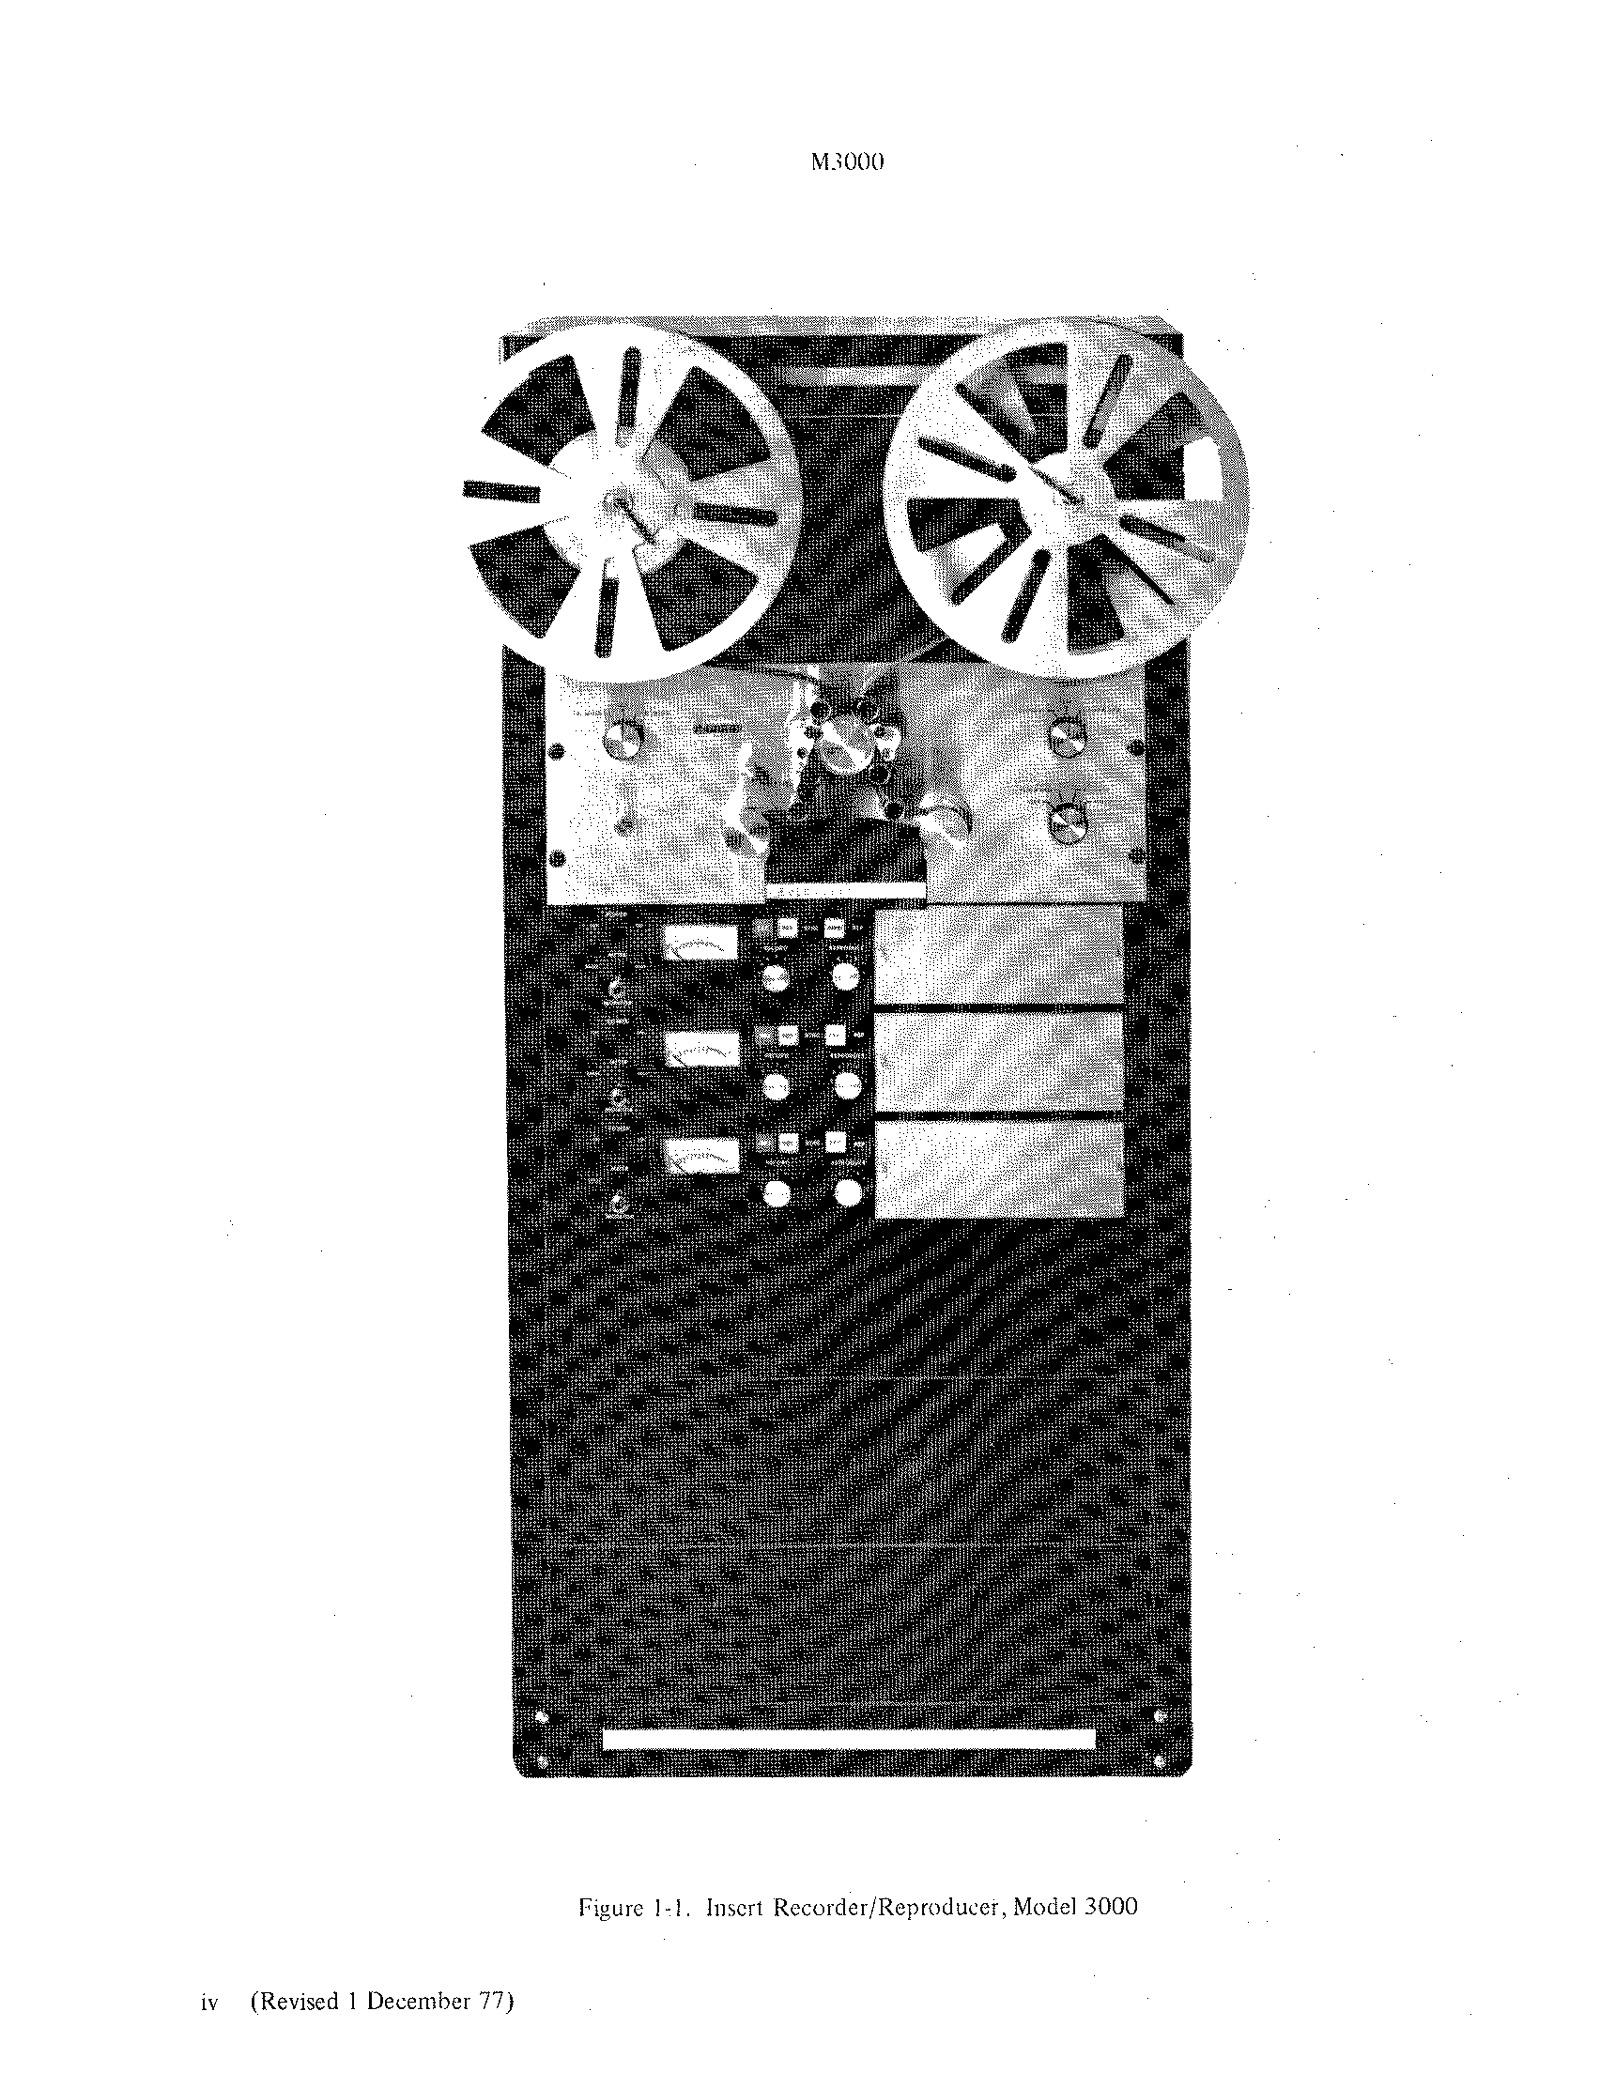 moviola model 3000 insert recorder reproducer technical manual ebay Manual Template Manual Handling Injuries